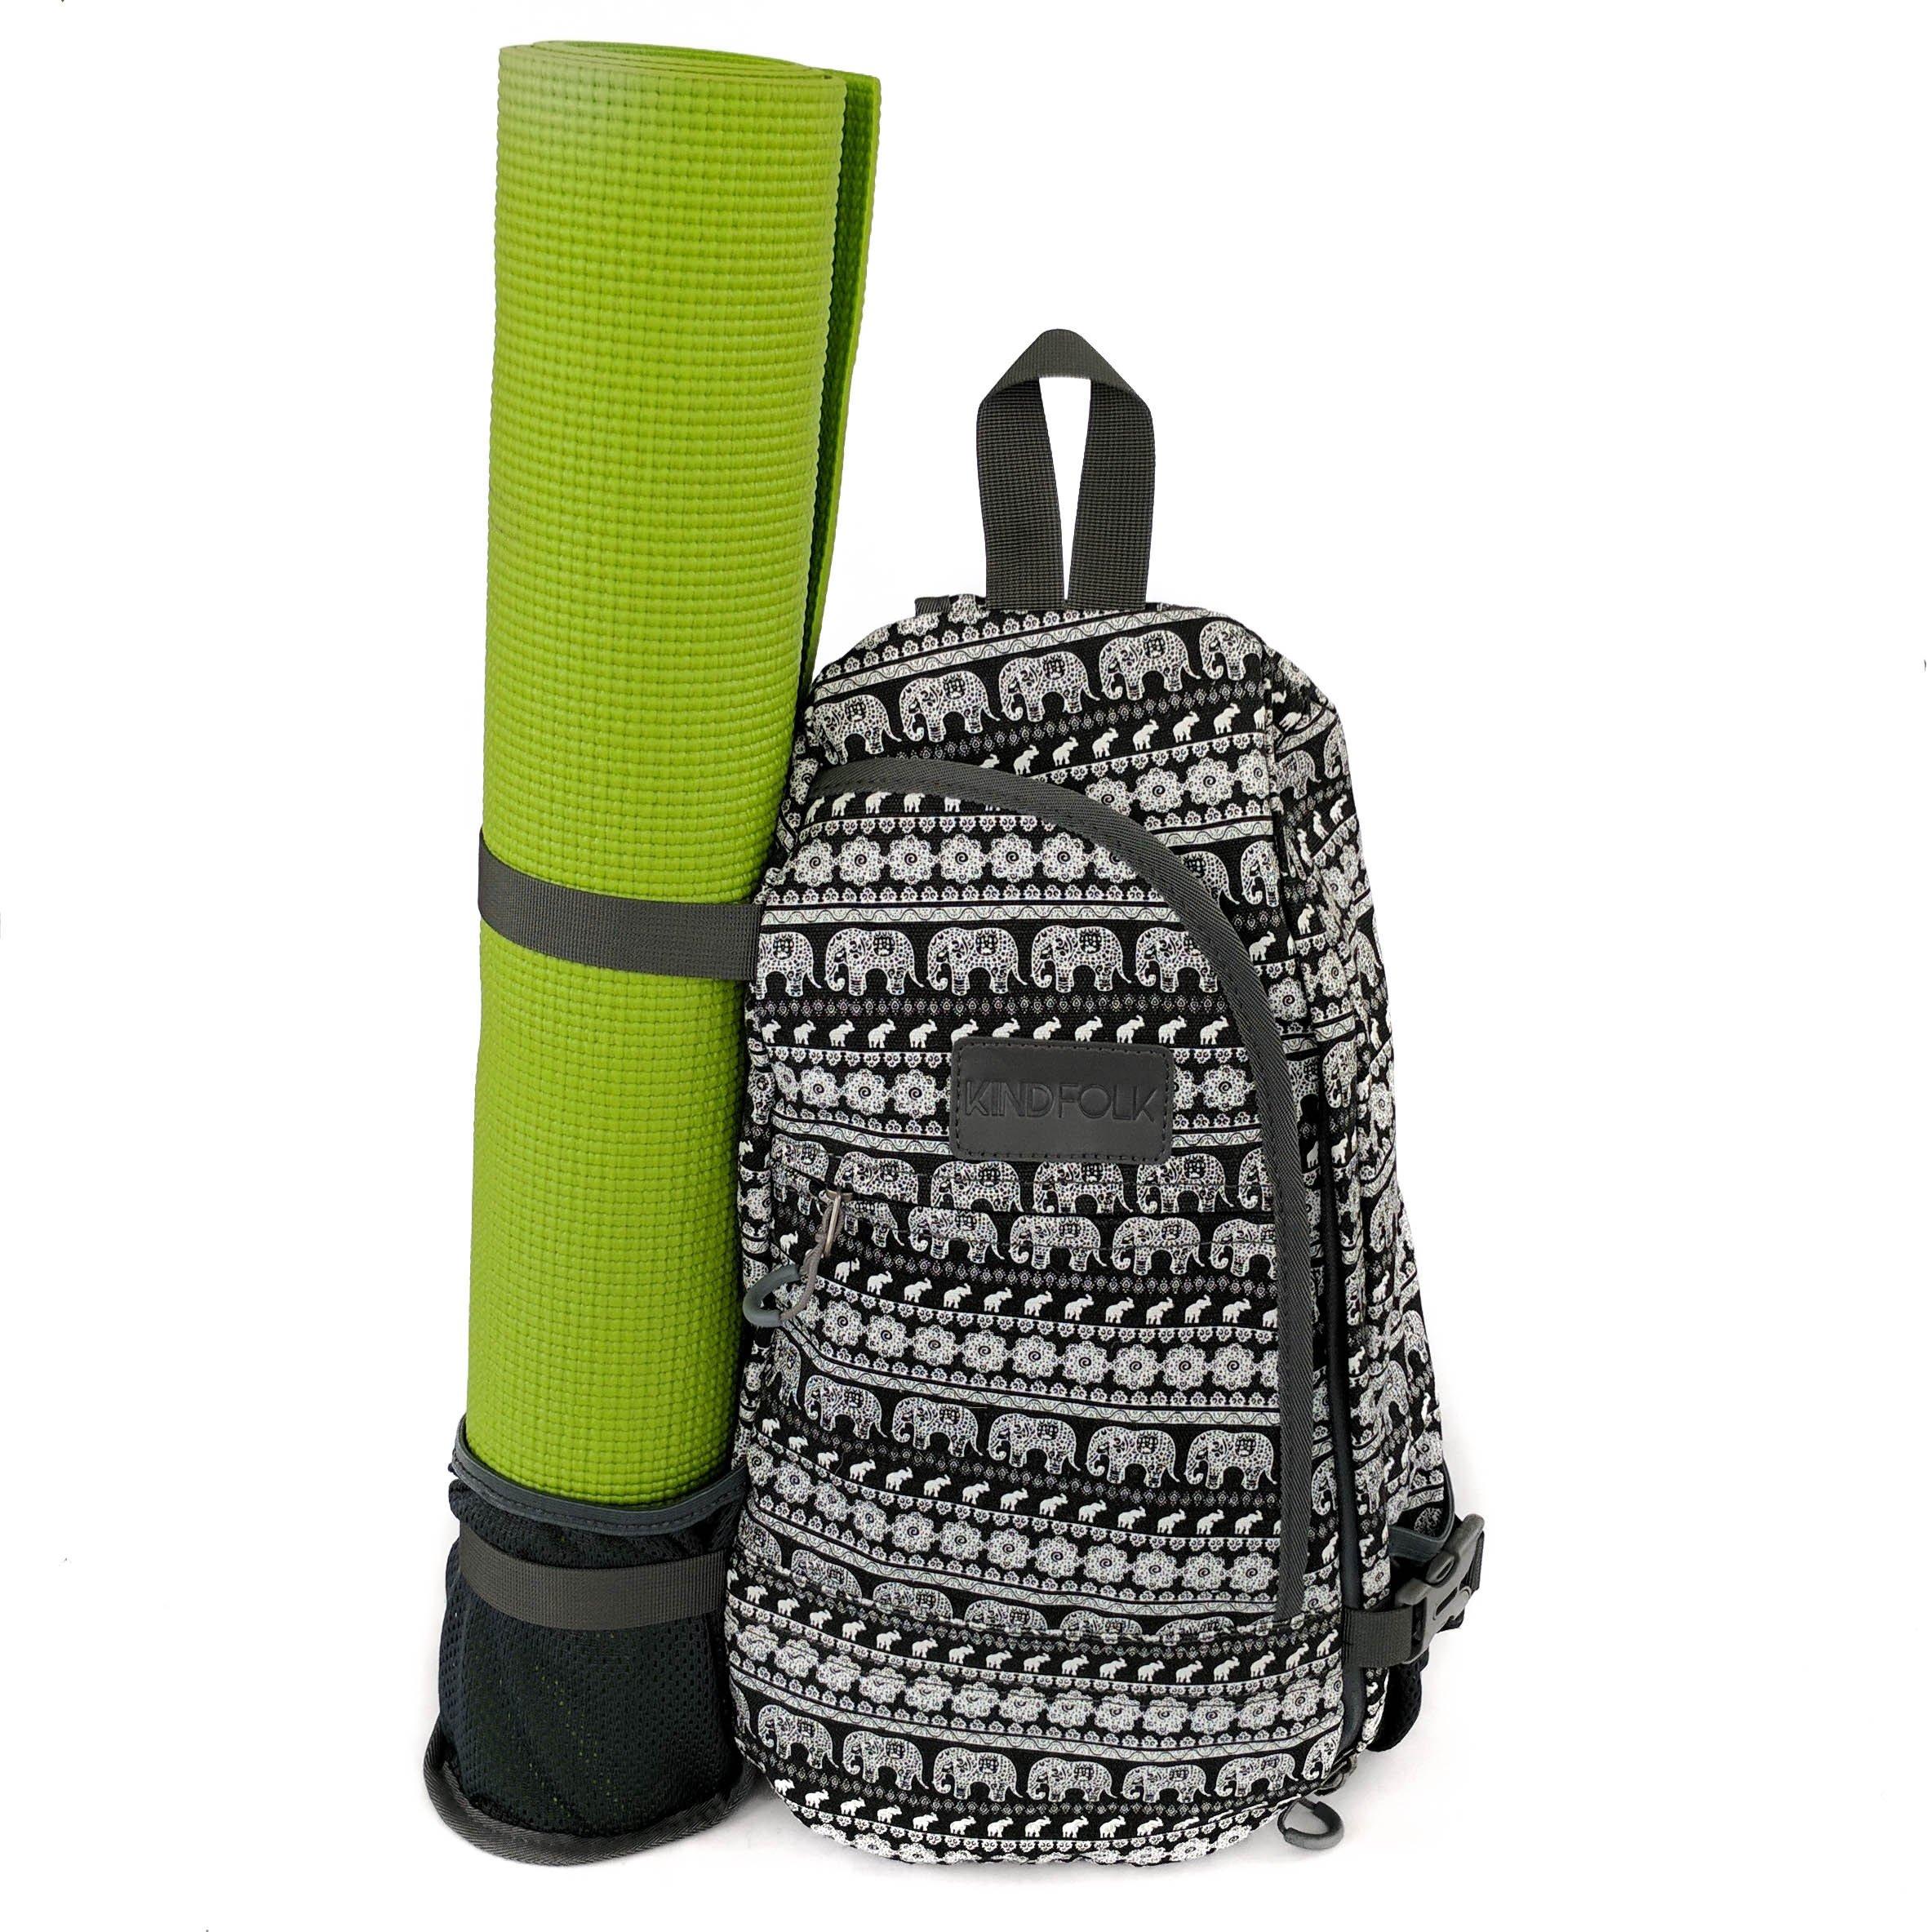 Kindfolk Yoga Mat Backpack Crossbody Style One Strap (Parade)